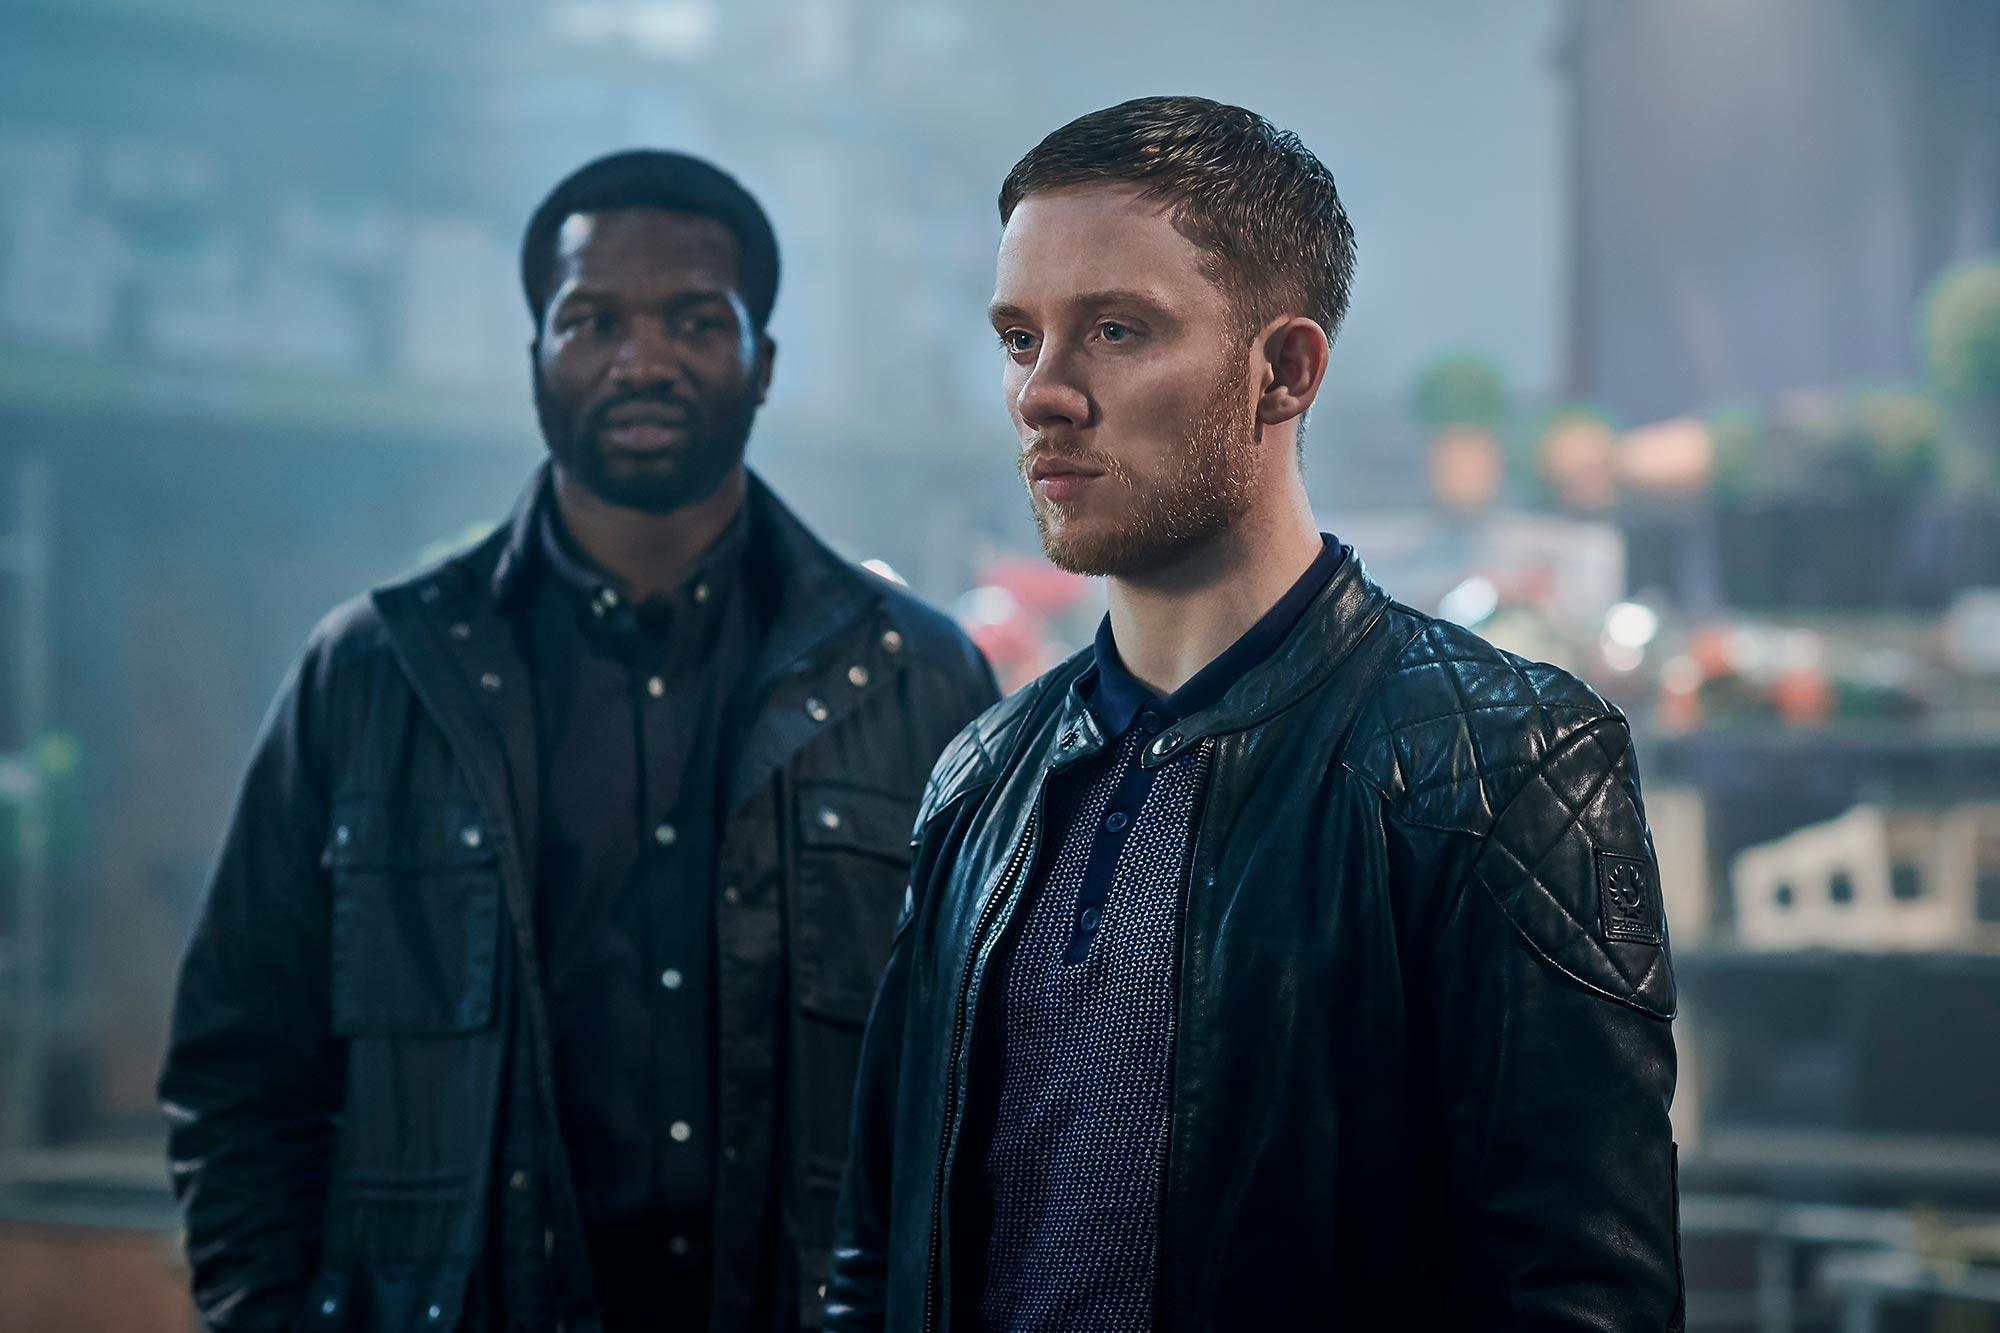 The Raid Director Previews His Bone Crunching Crime Show Gangs Of London Ew Com